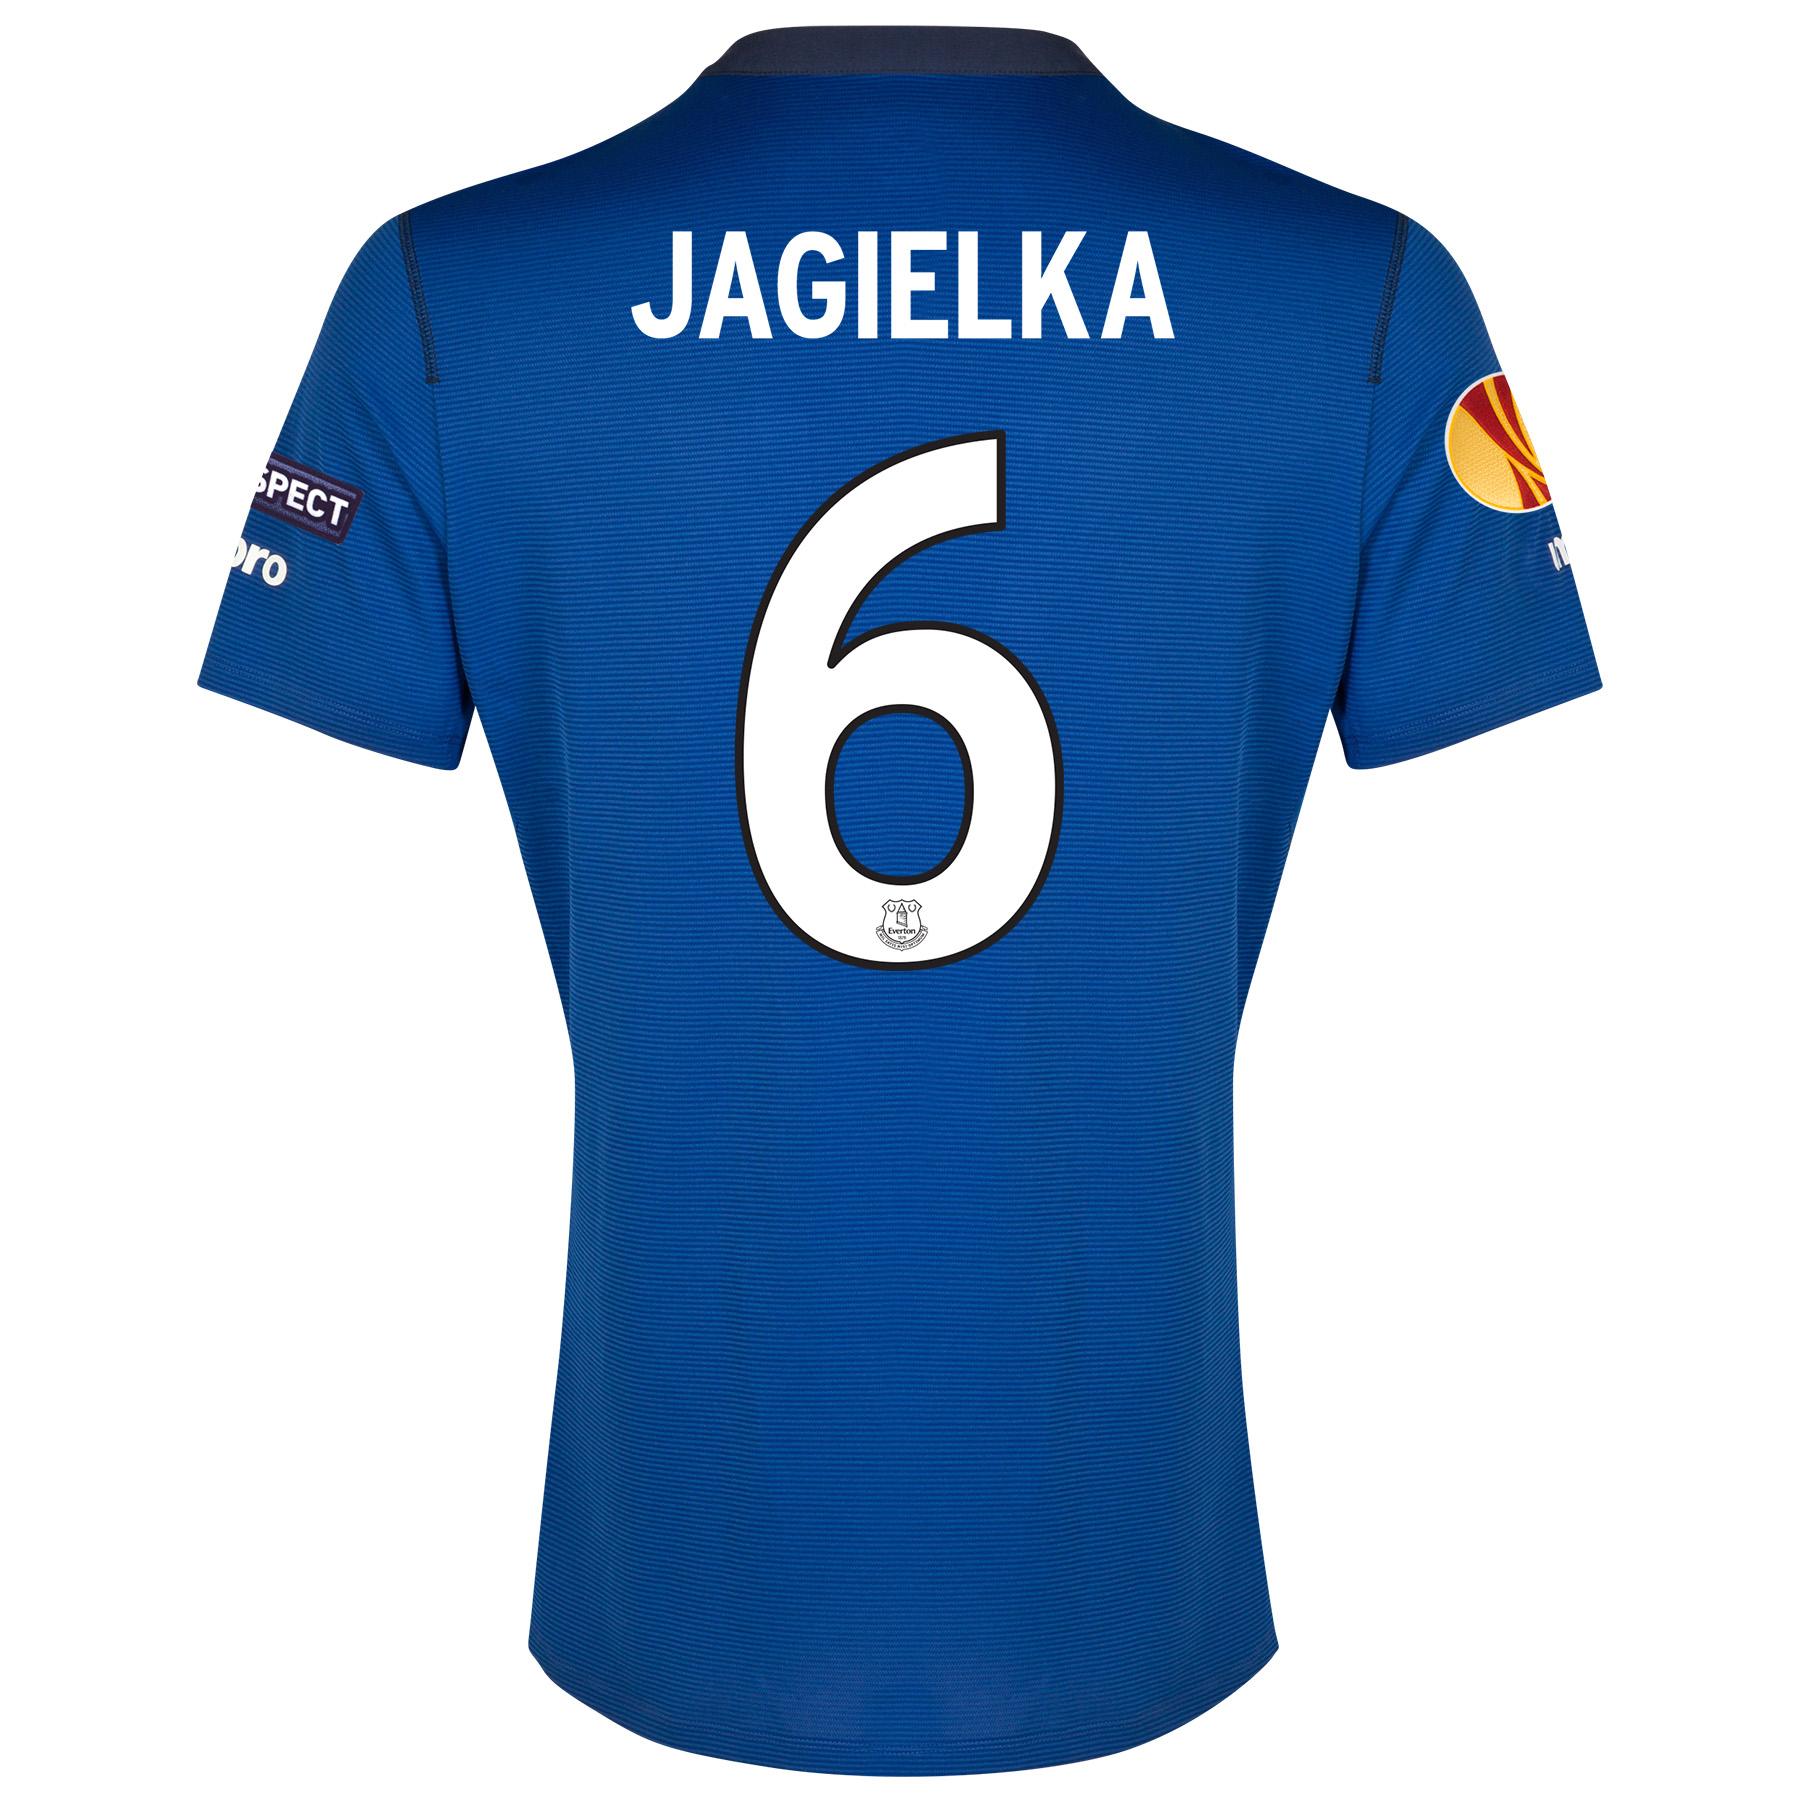 Everton UEFA Europa League Home Shirt 2014/15 with Jagielka 6 printing